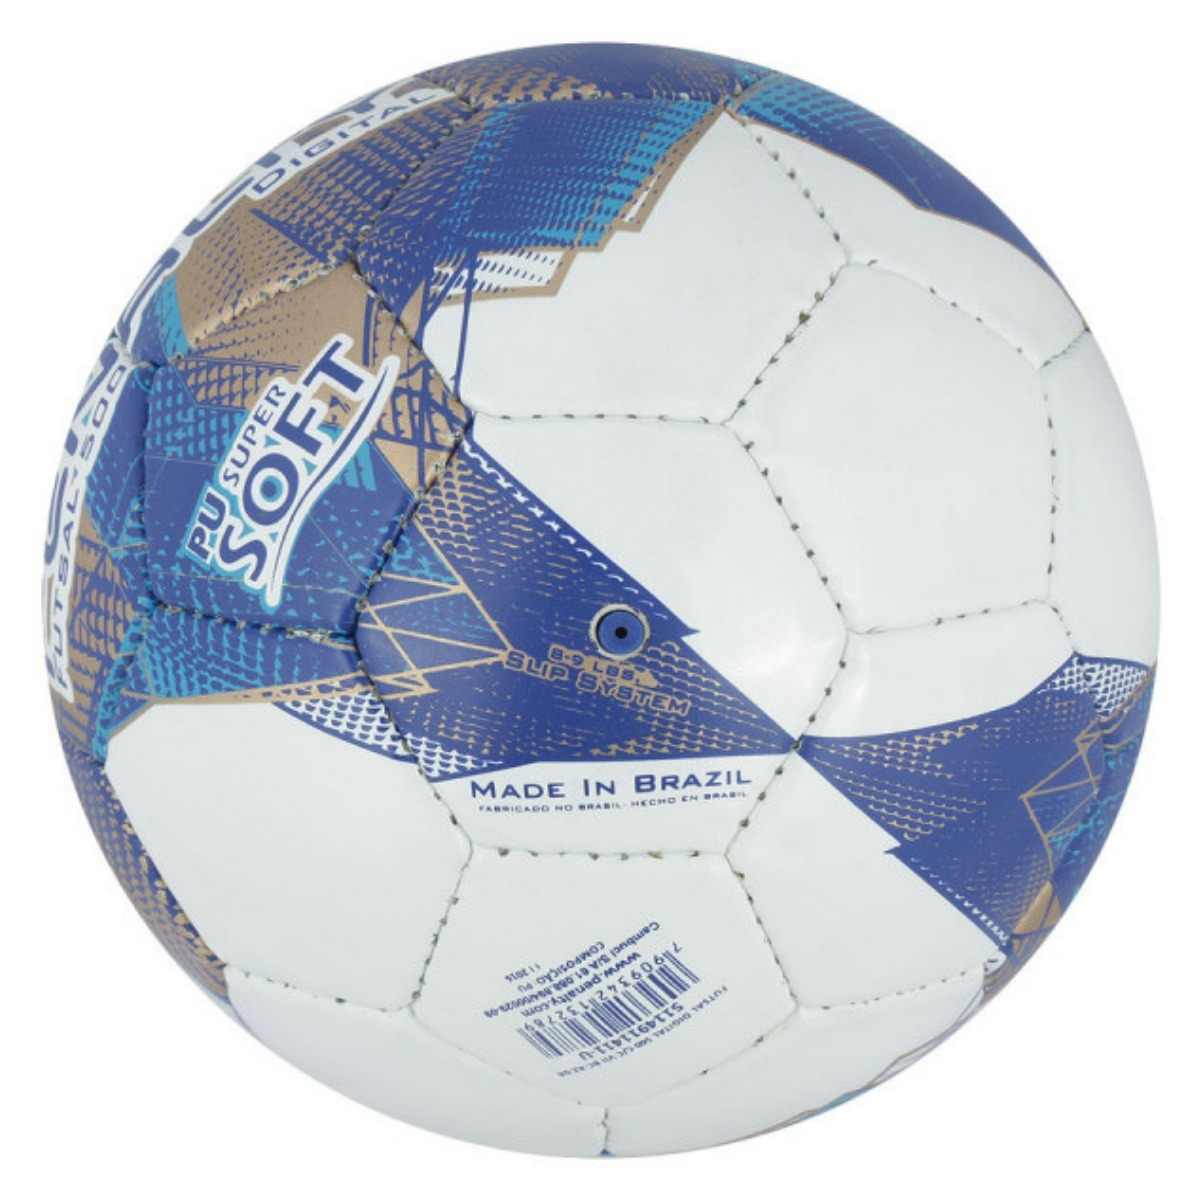 bola futsal penalty digital 500 com costura à mão 7 - branco. Carregando  zoom... bola futsal penalty. Carregando zoom. 4e1d5435808e6